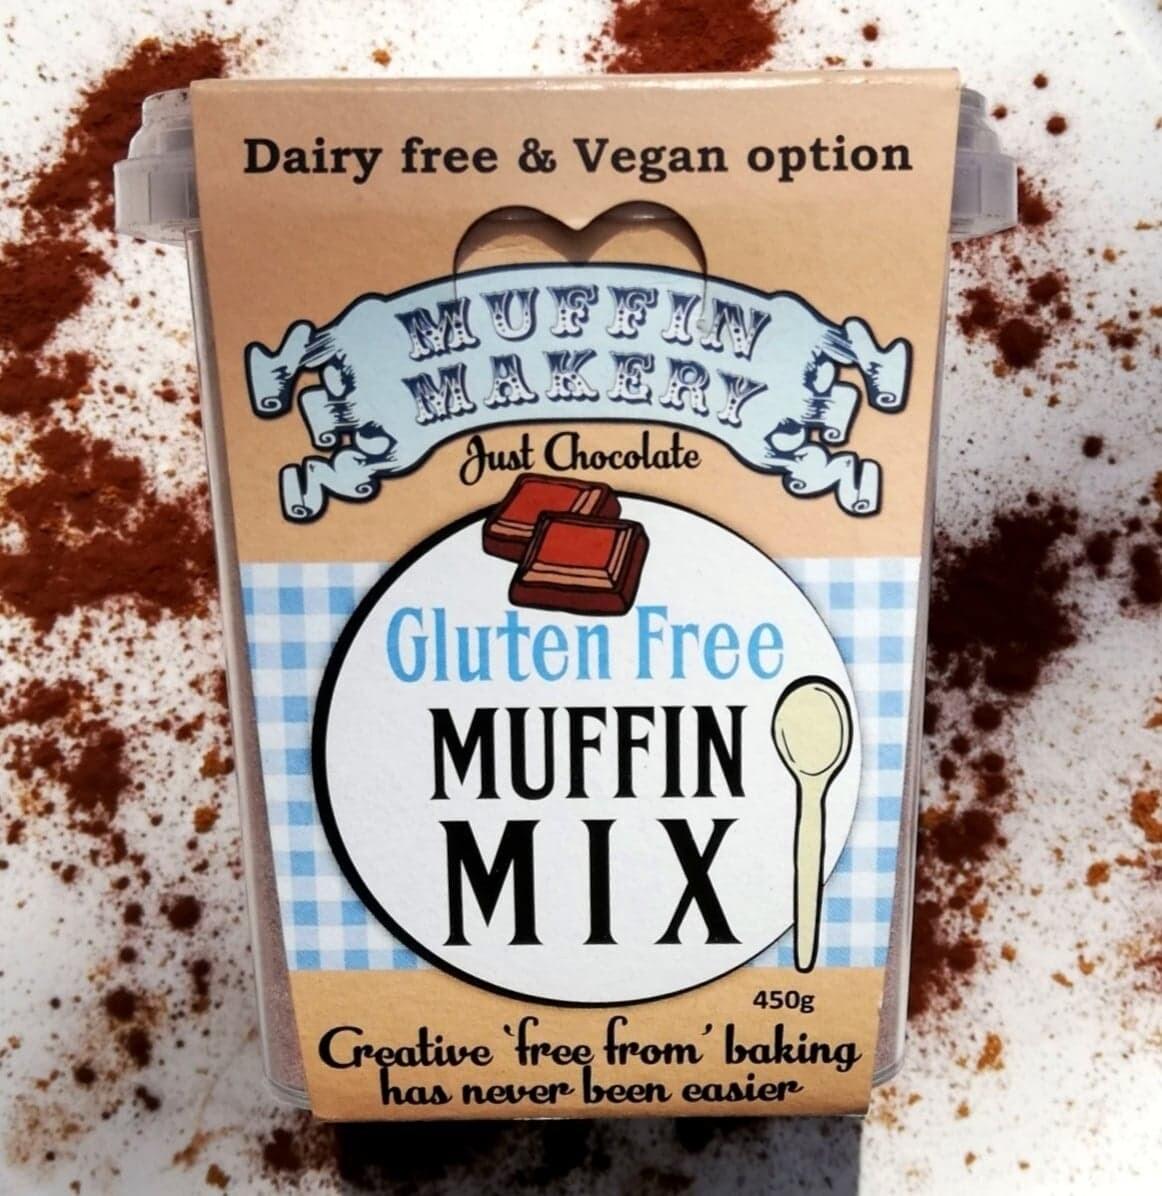 Just Chocolate Gluten Free Muffin Mix